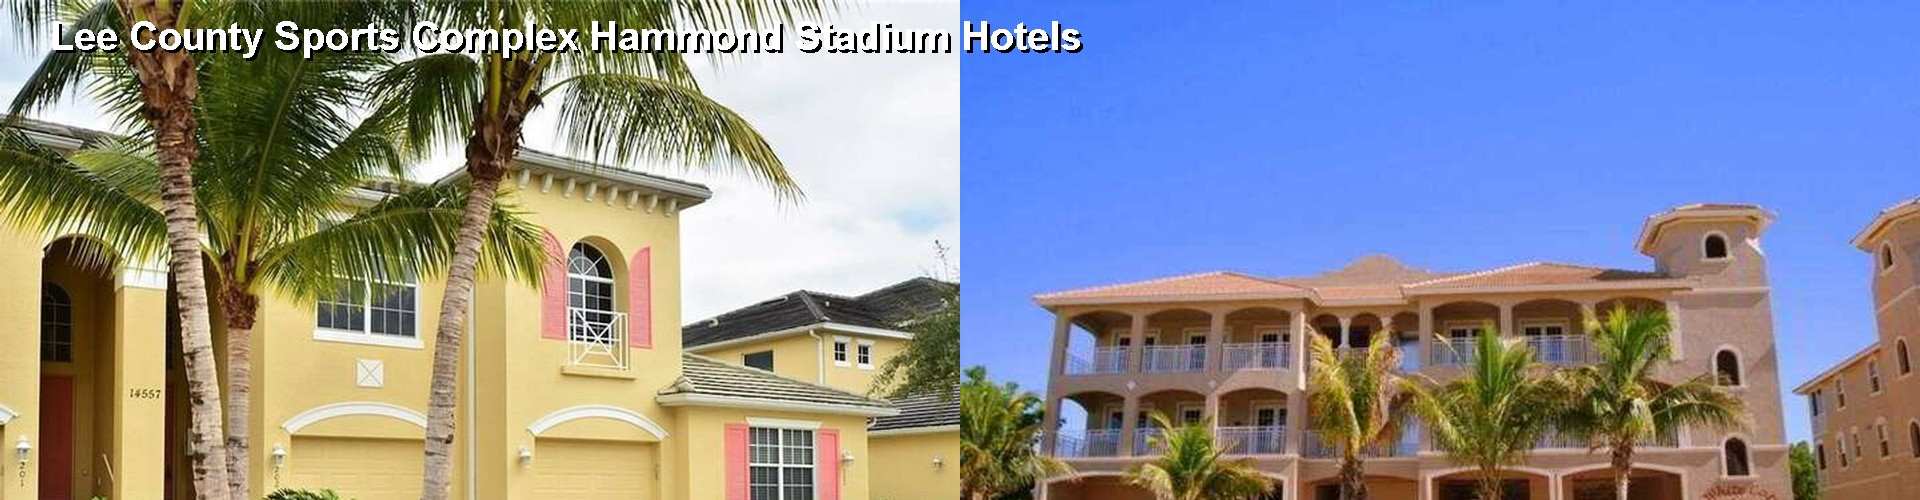 5 Best Hotels Near Lee County Sports Complex Hammond Stadium